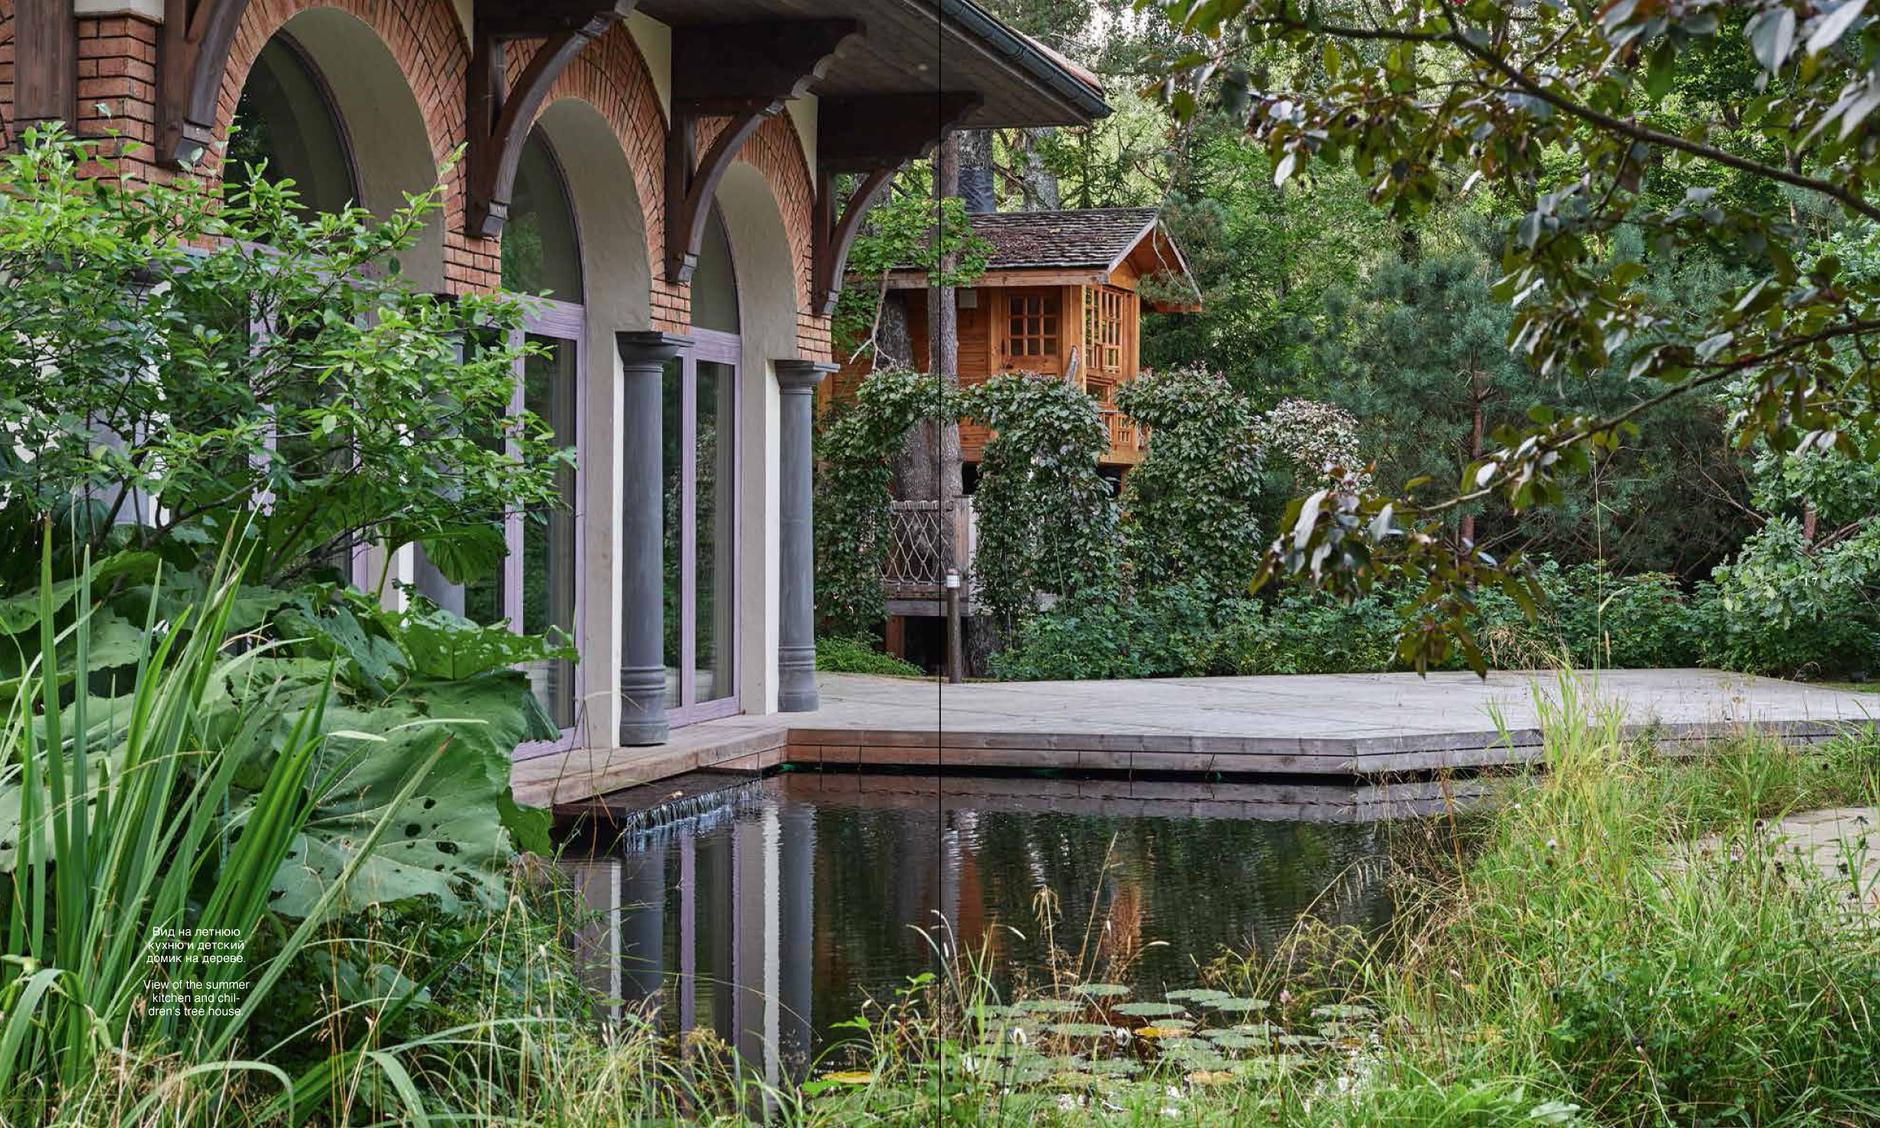 Х лет. Х садов: книга о ландшафтном дизайне от бюро MOX (галерея 4, фото 0)